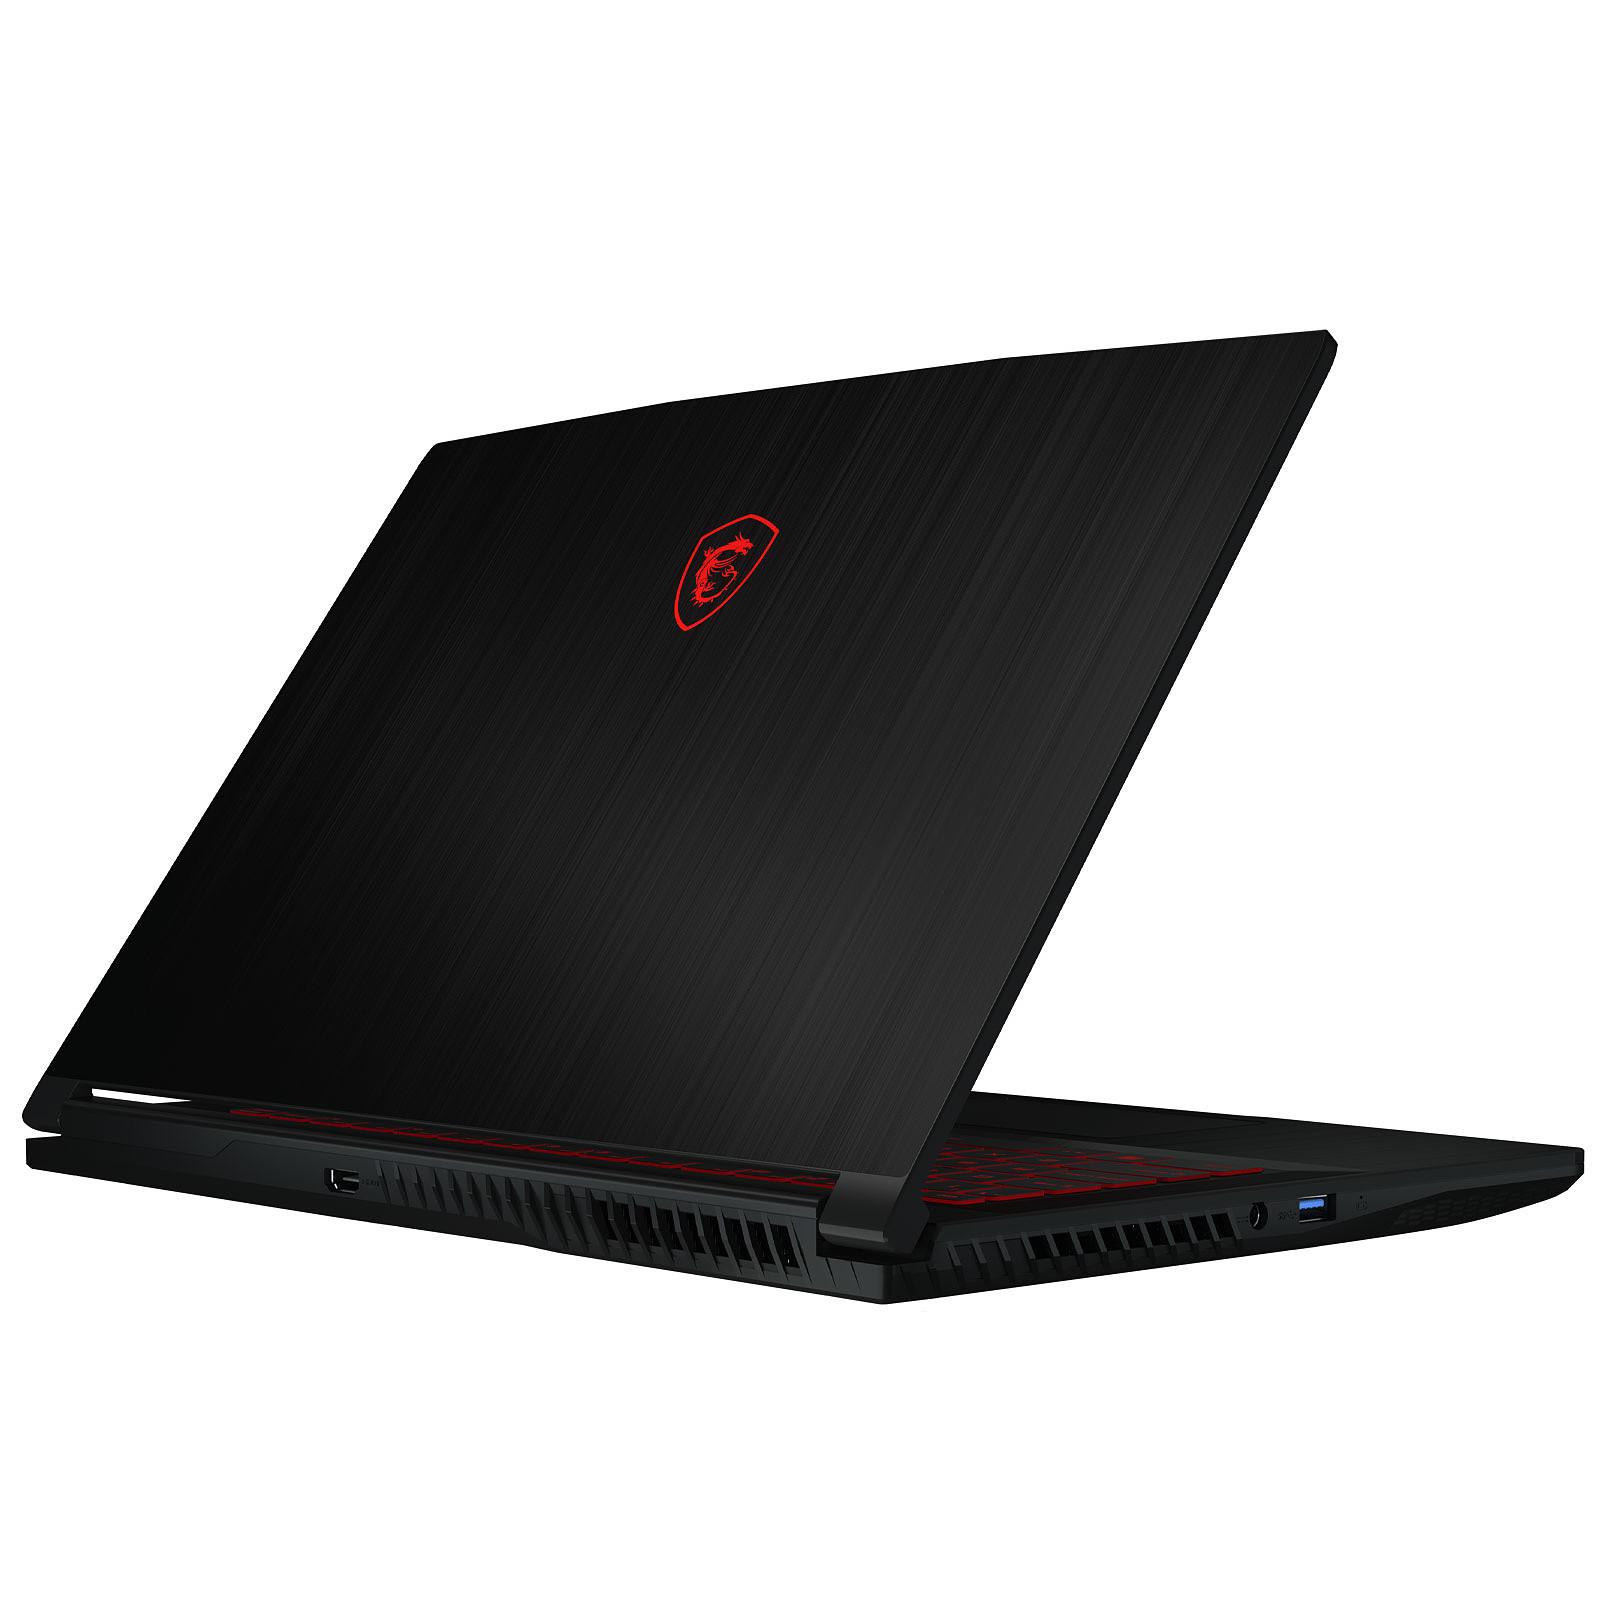 GF63-Thin-10SCSR-683FR - Noir